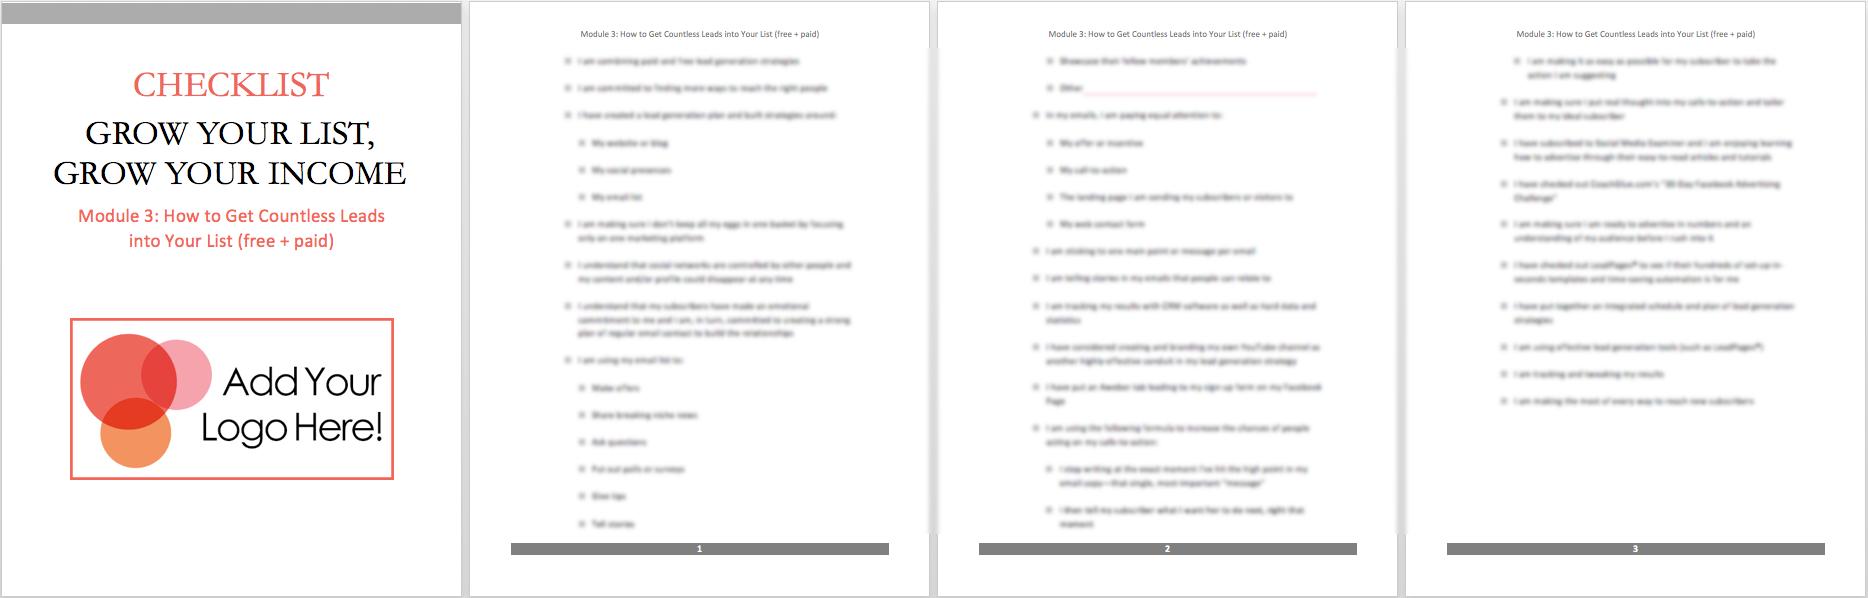 mod 3 checklist